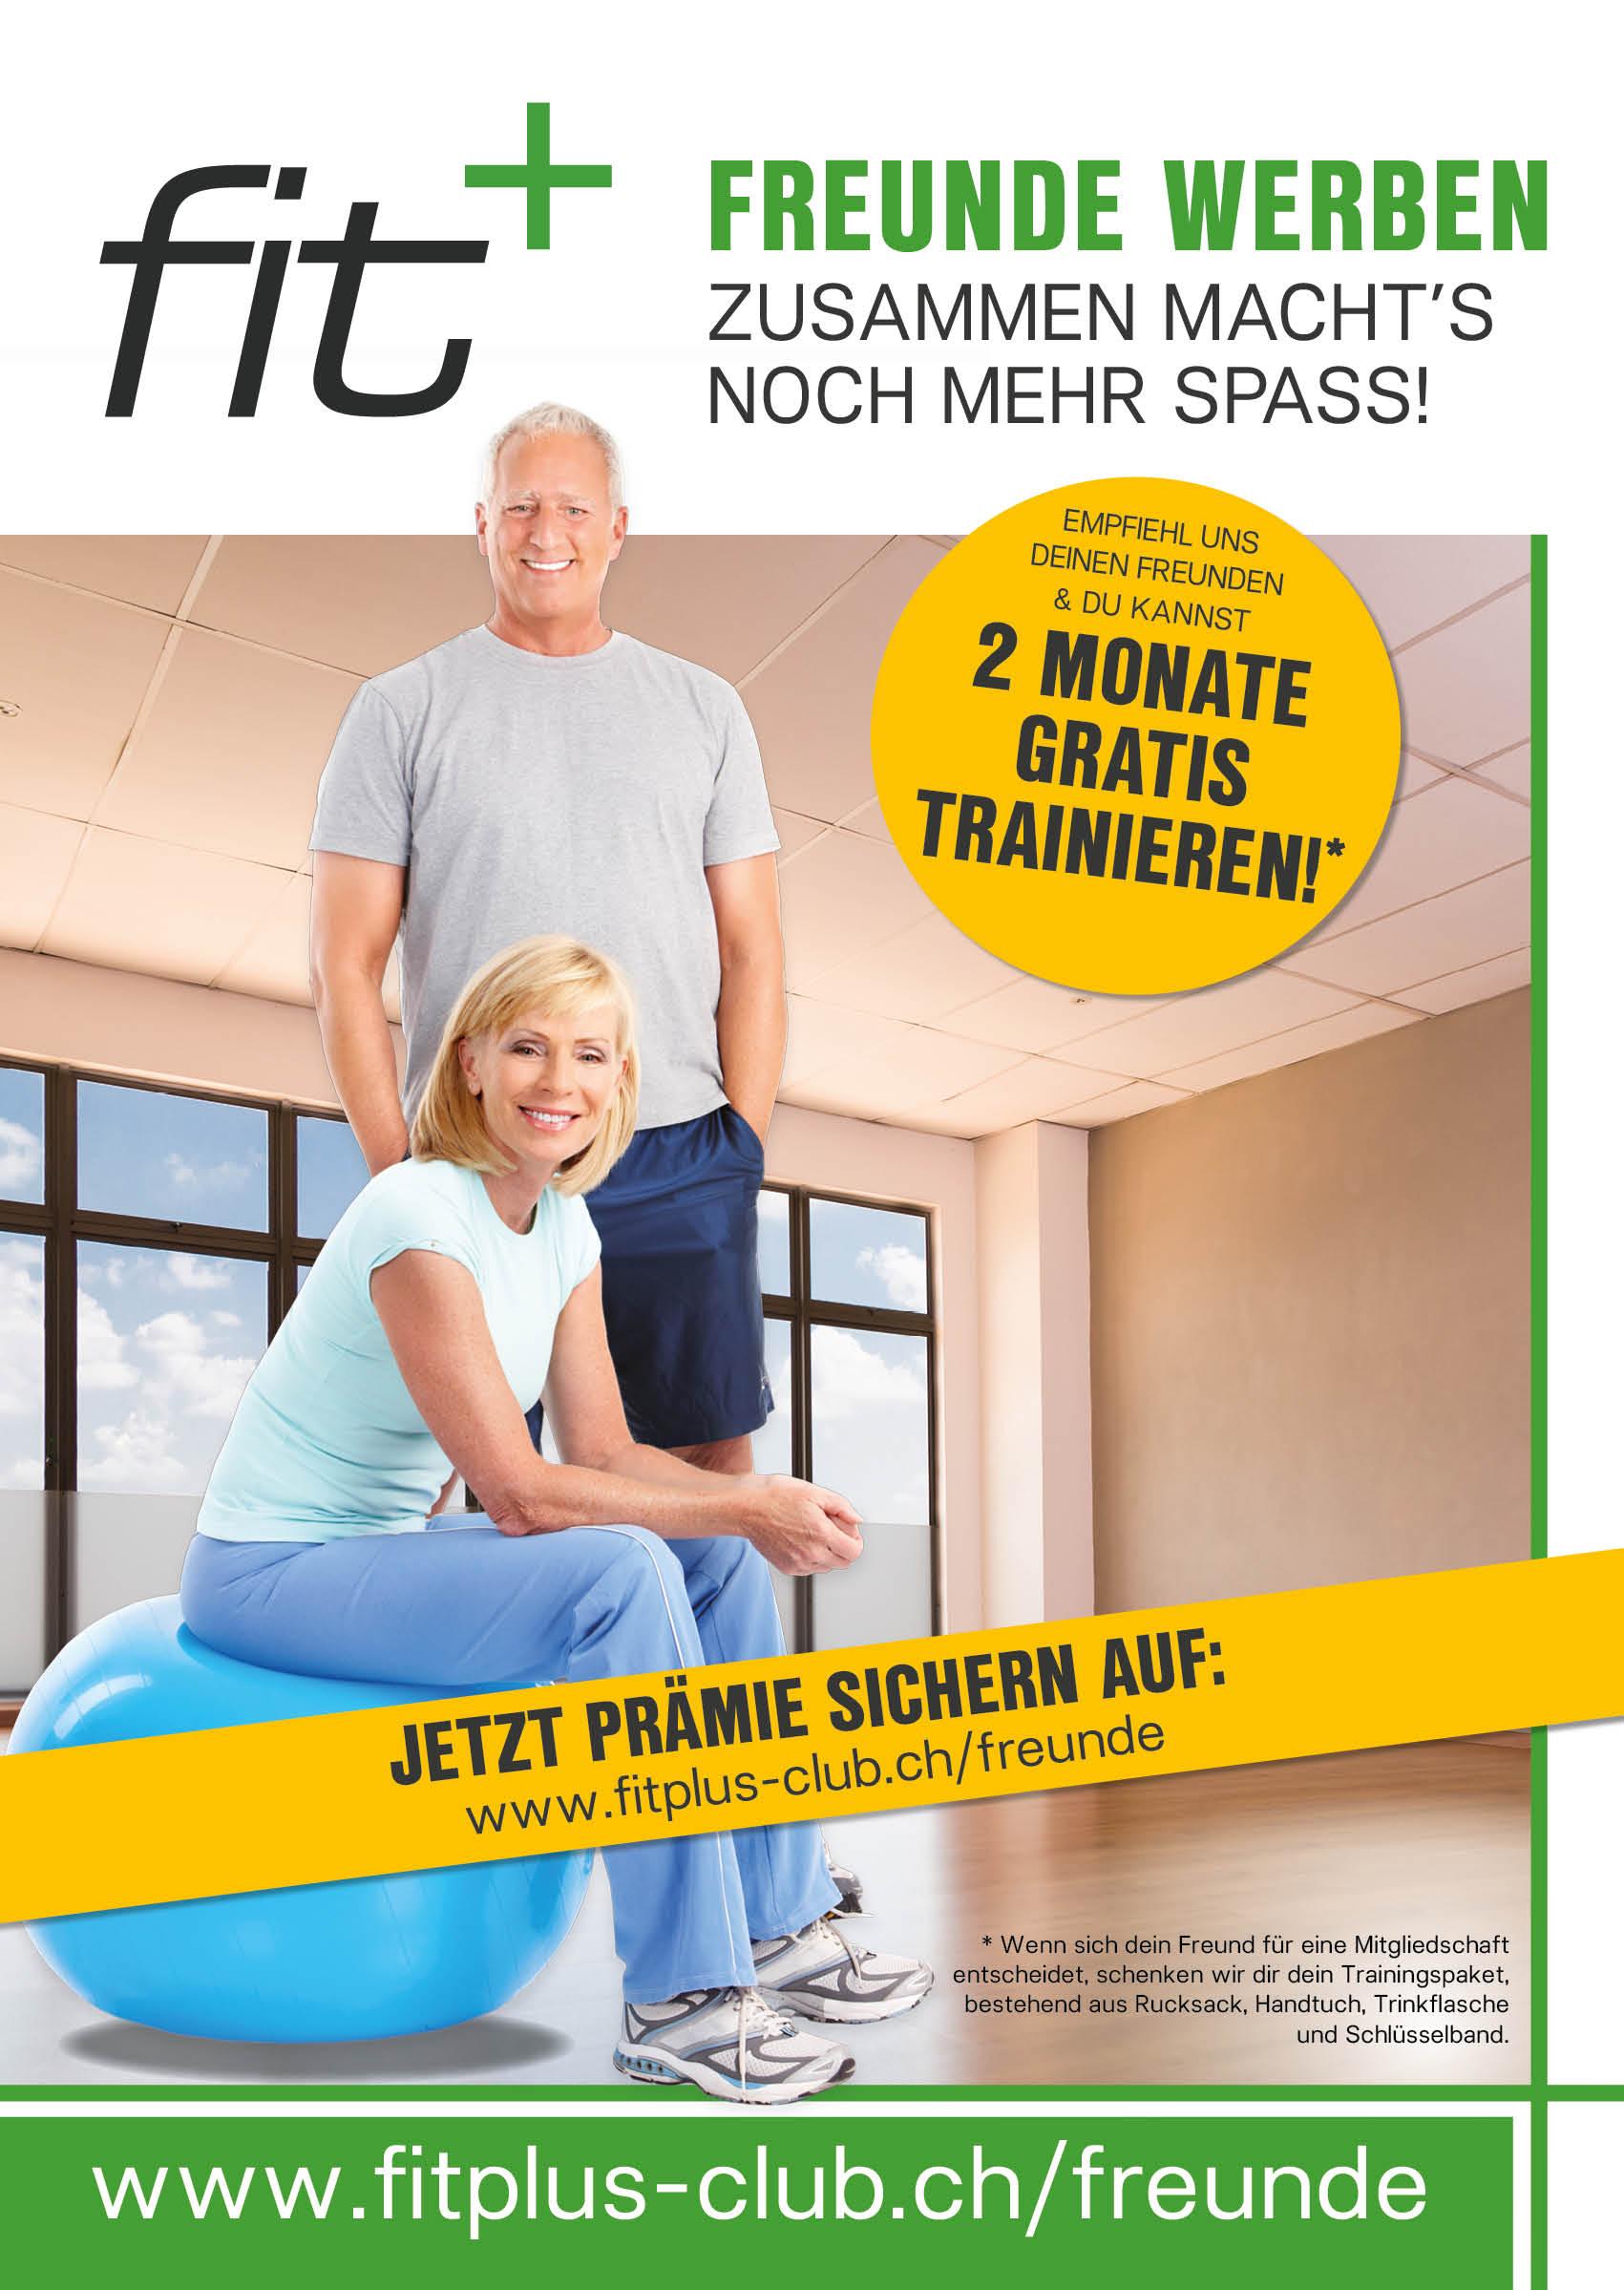 online_RZ_fit+ Freunde werben_Plakat_2 Monate_A1_ch